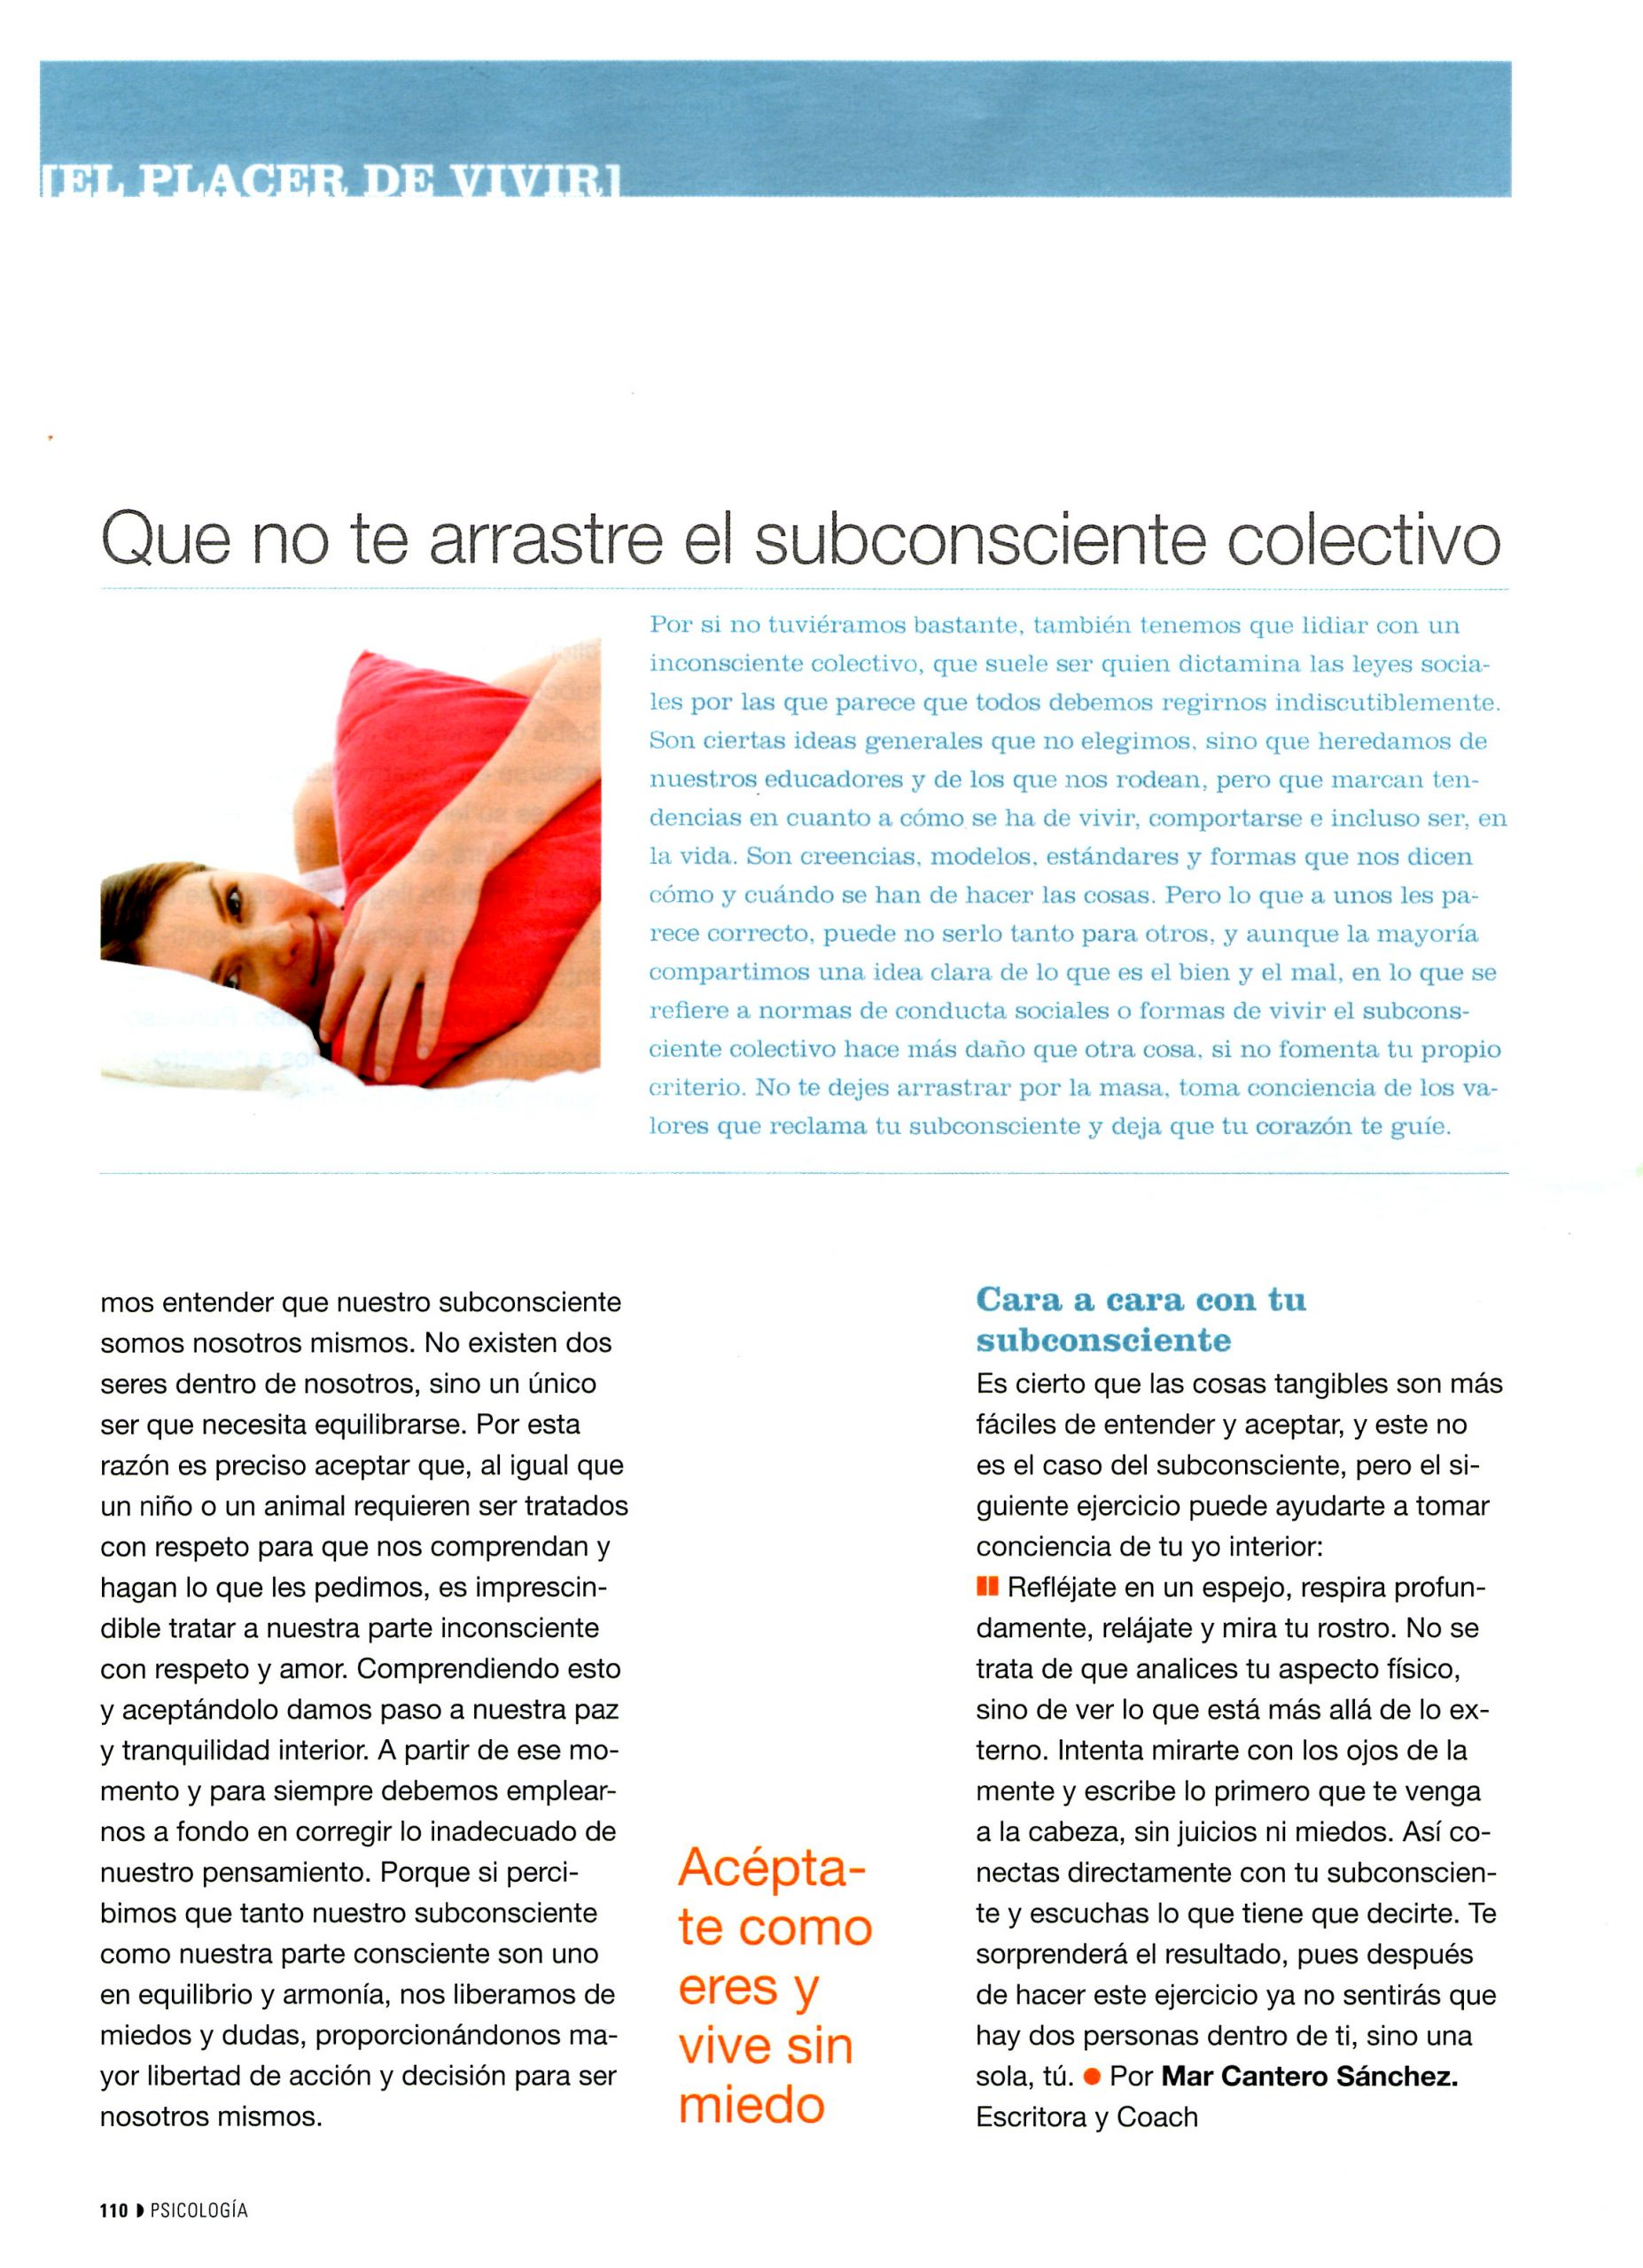 http://www.marcanterosanchez.com/wp-content/uploads/2015/04/CREER-EN-TI-ES-ESENCIAL-pag-4-PSICOLOGÍA-PRÁCTICA-5-2010-Mar-Cantero-Sánchez-www.marcanterosanchez.com_.jpg